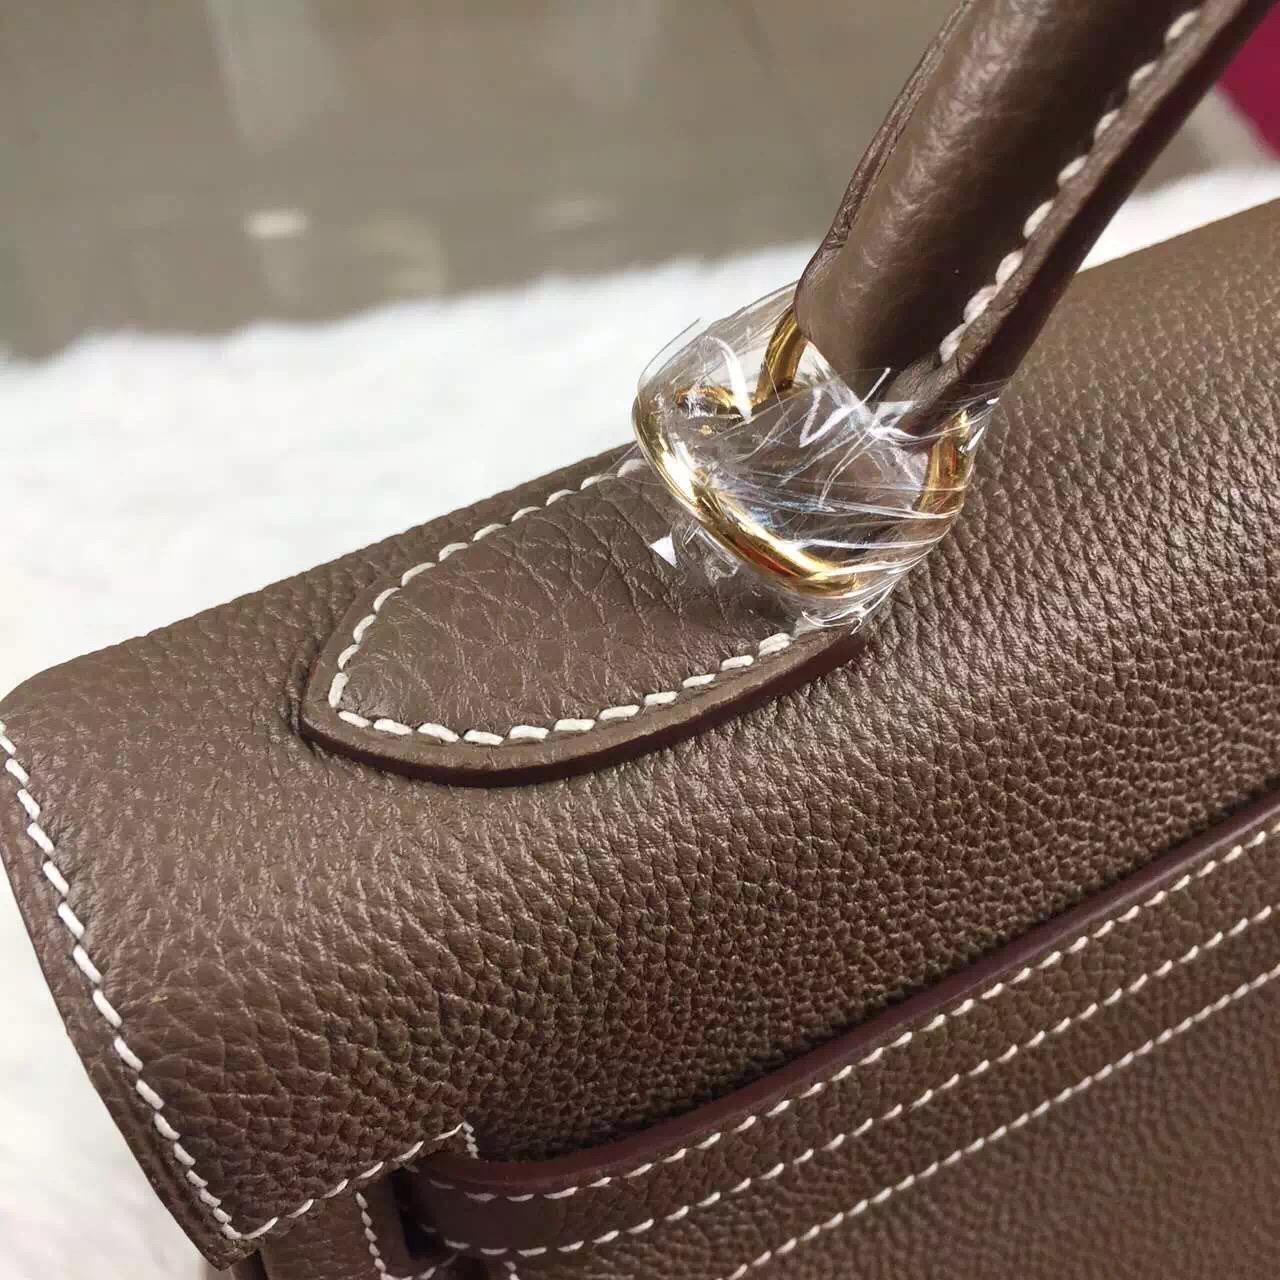 Discount Hermes C81 Etoupe Grey Togo Leather Kelly Bag 32CM Elegant Women's Handbag